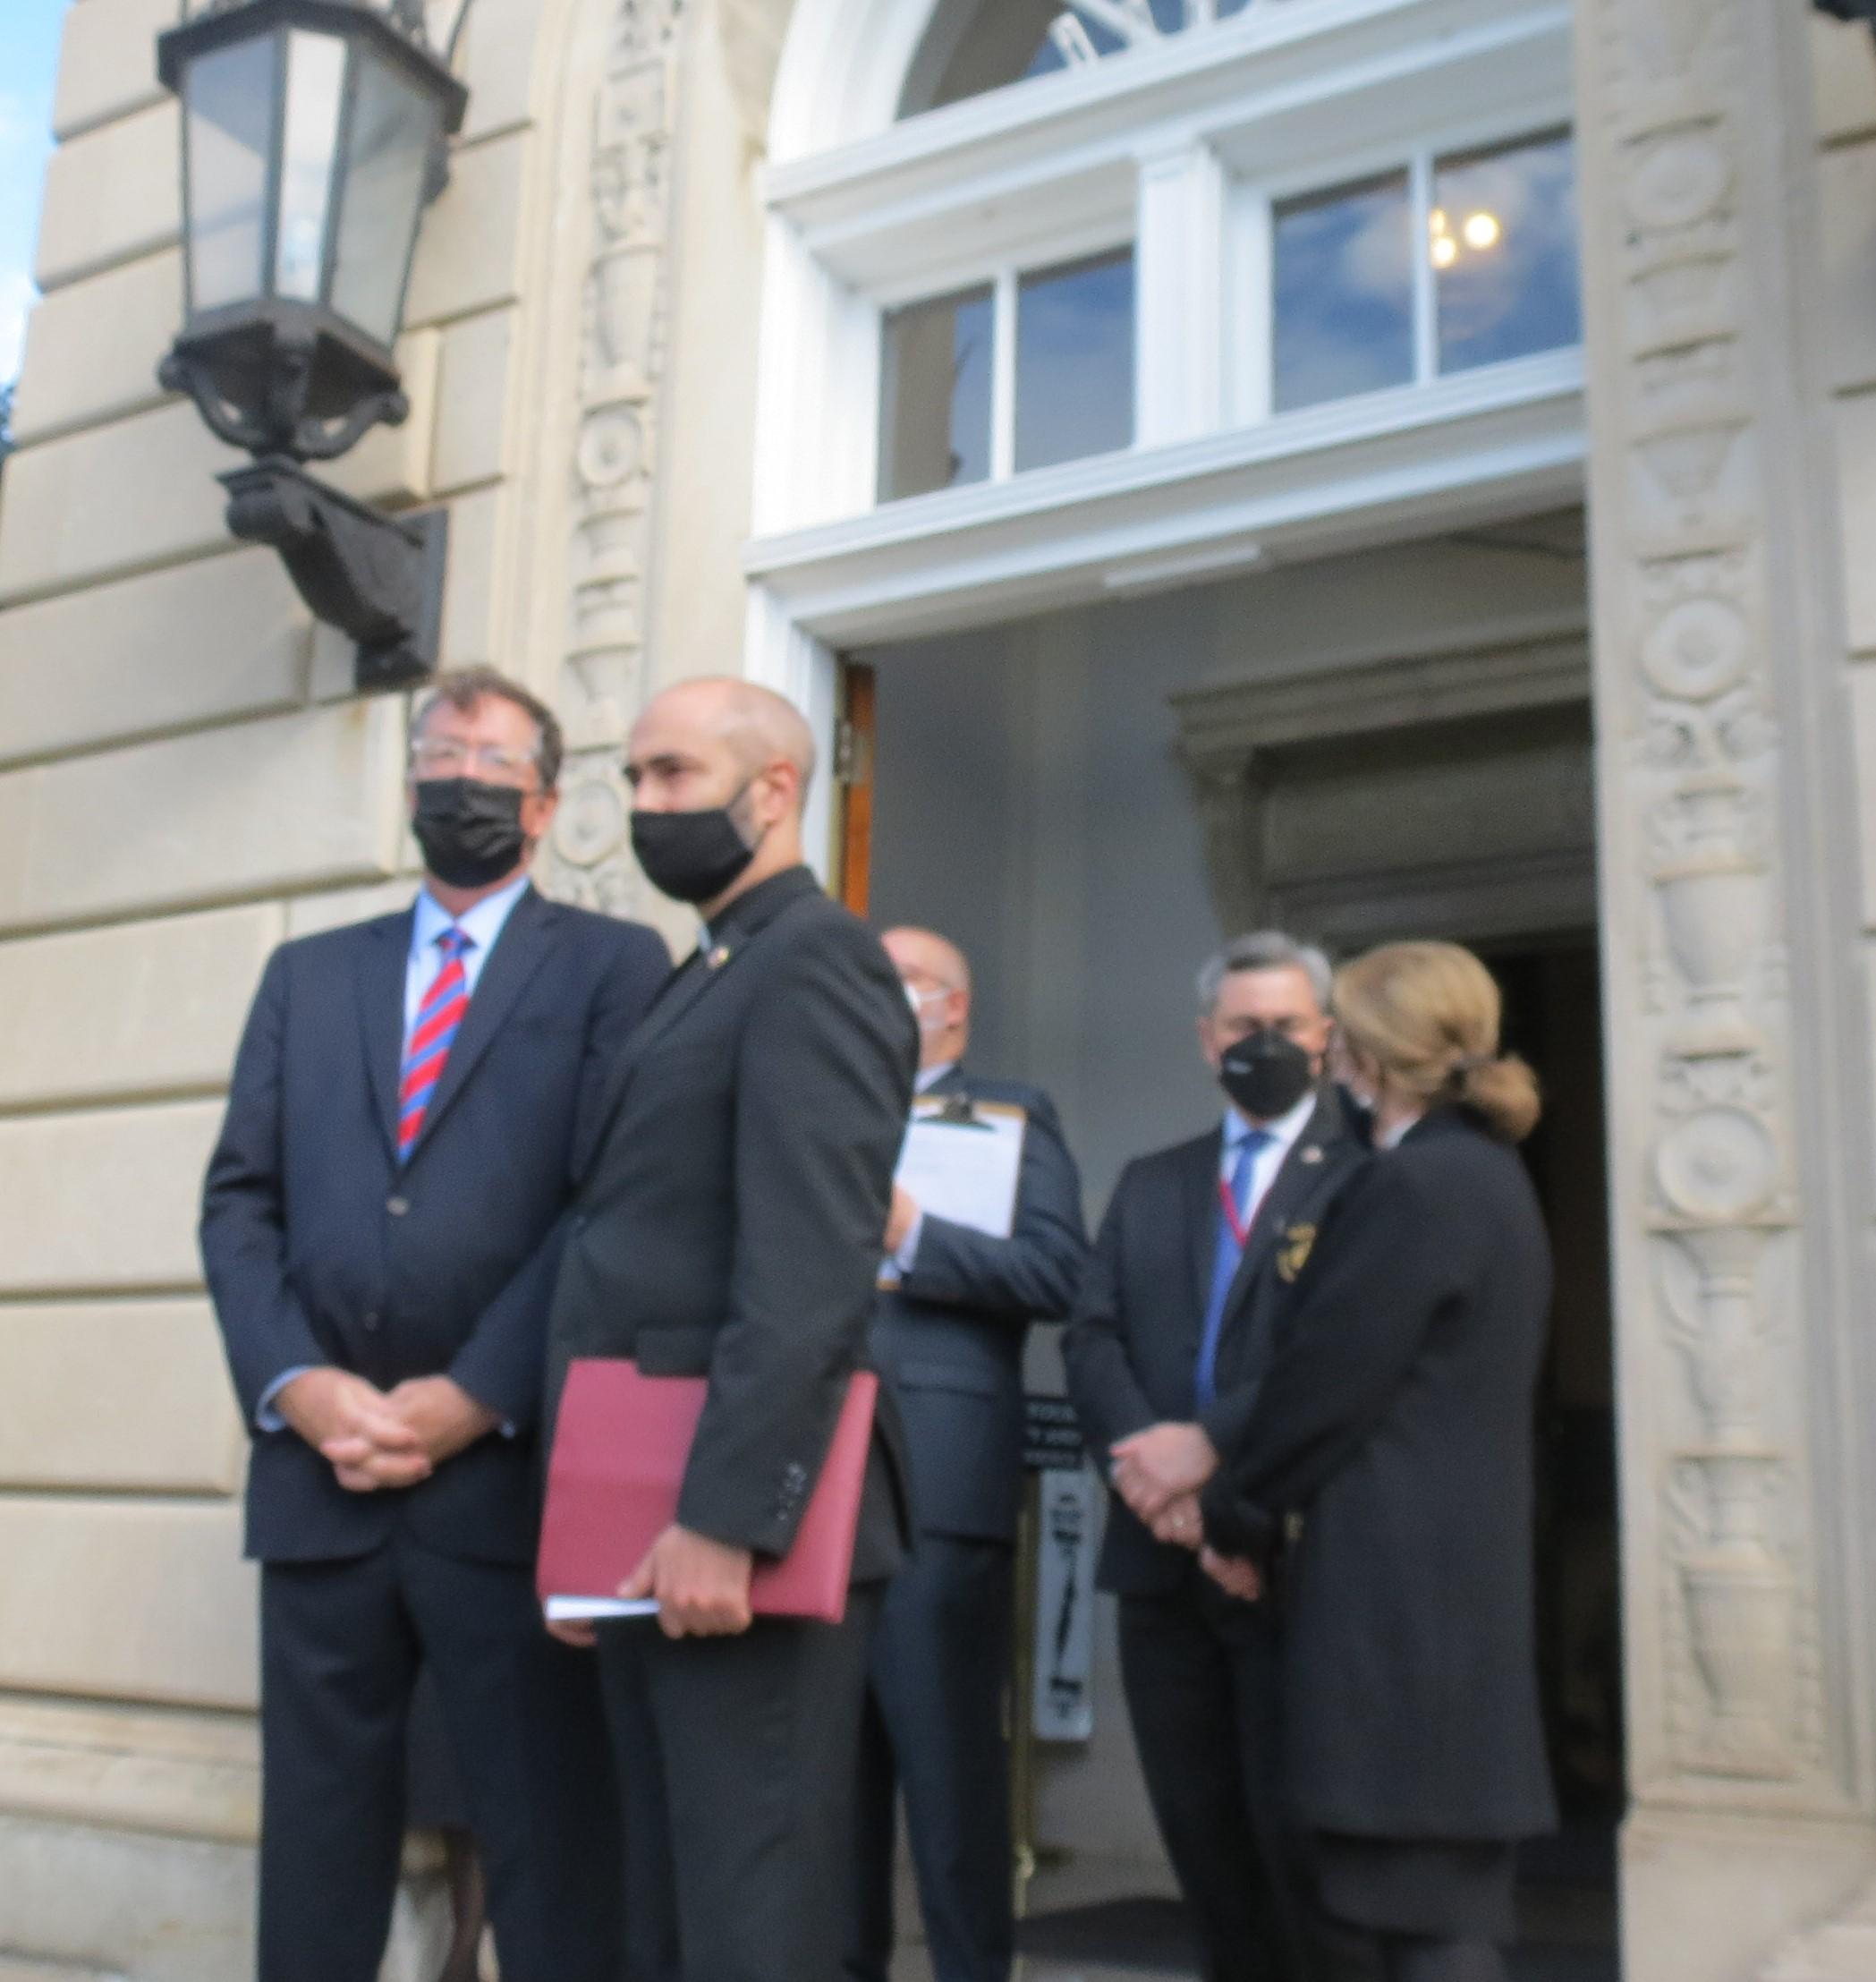 Awaiting the Ecumenical Patriarch's arrival, Father Nicholas Kazarian